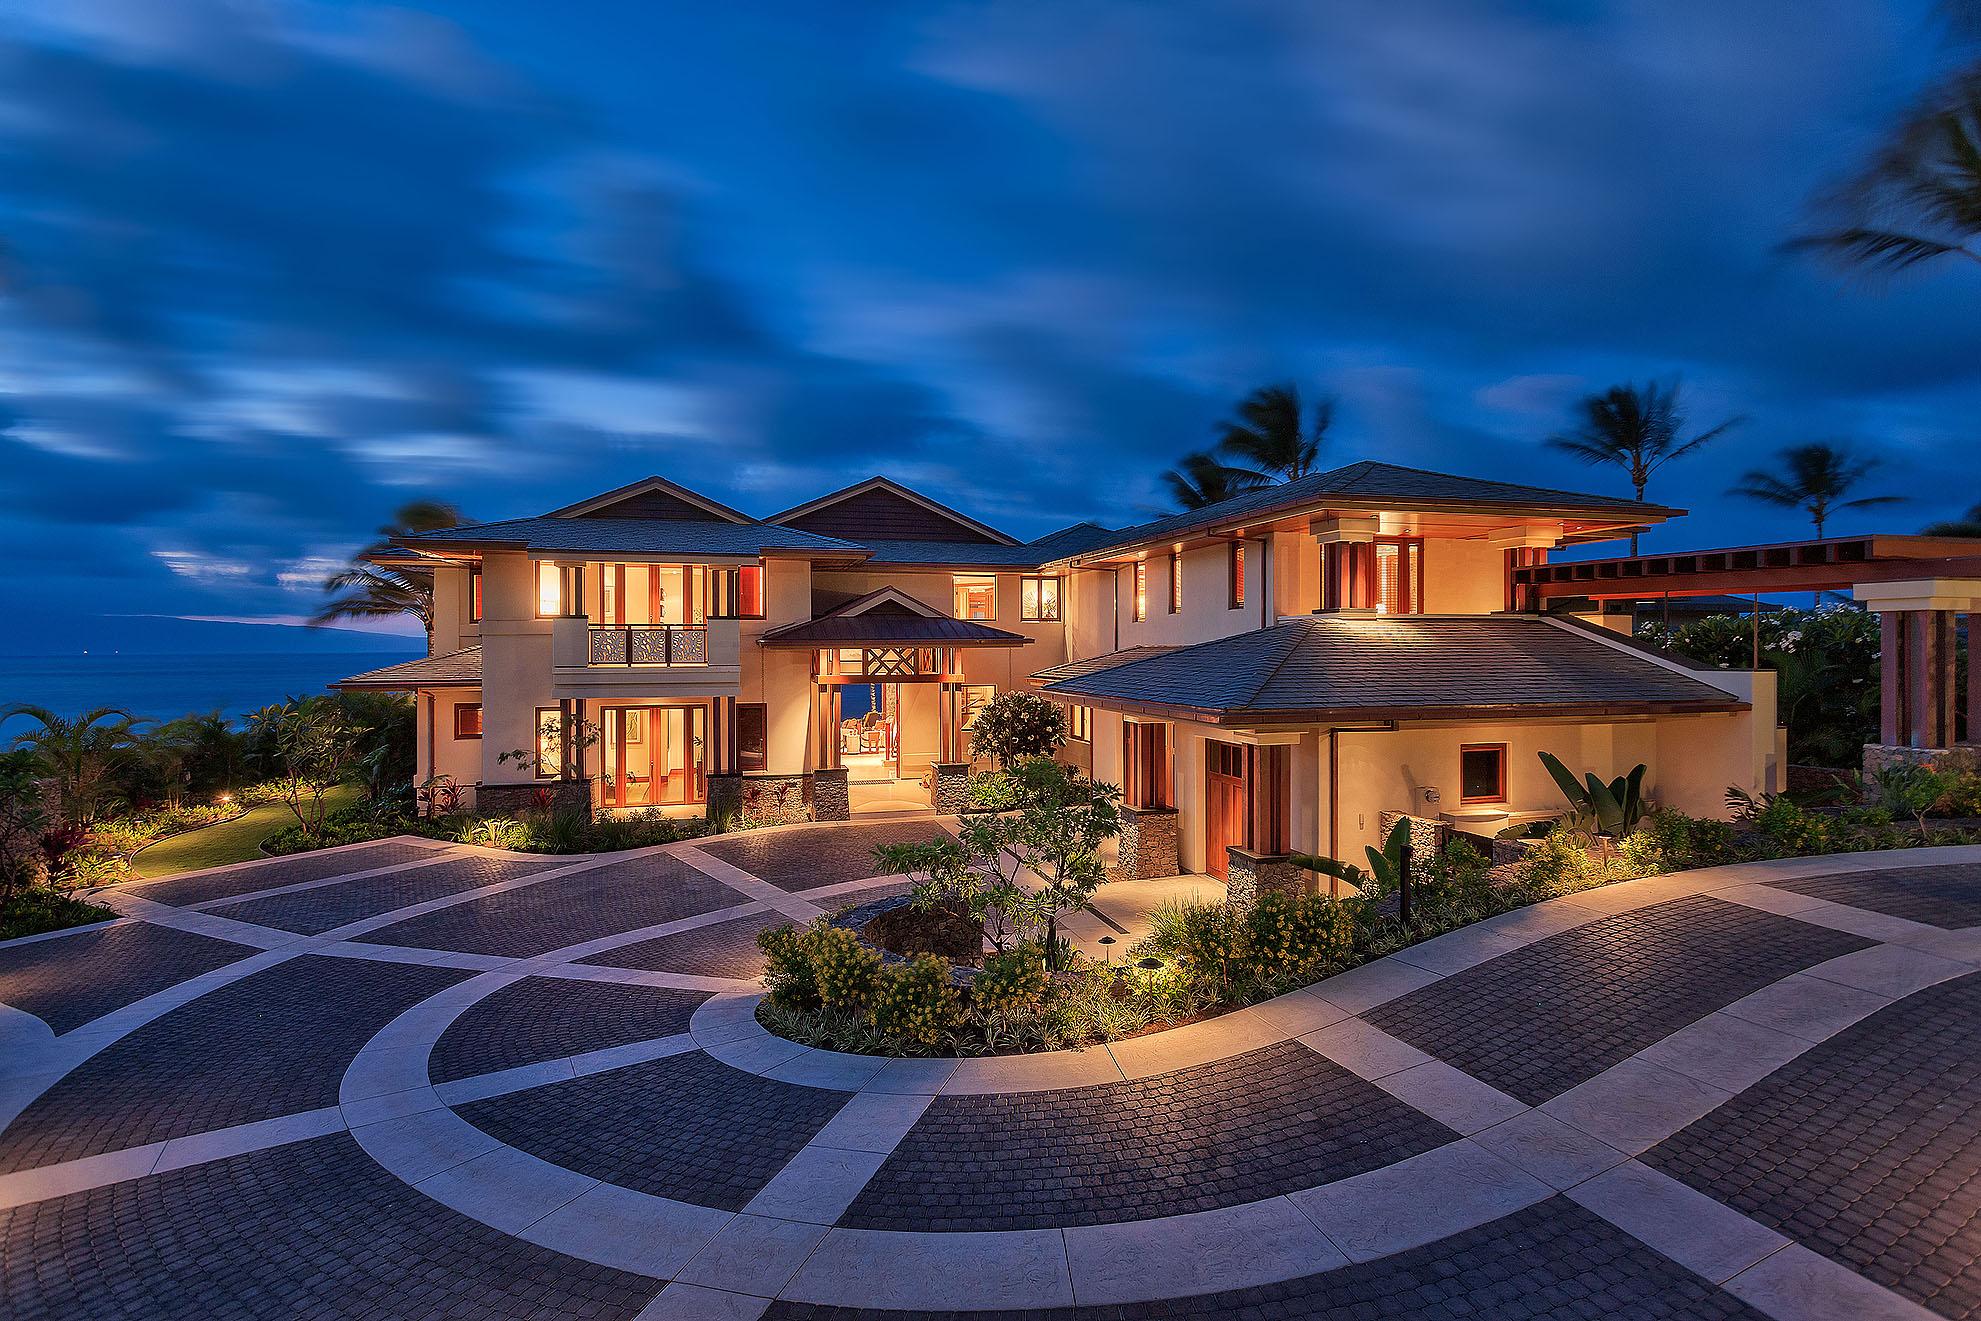 Maui Vacation Home Photography